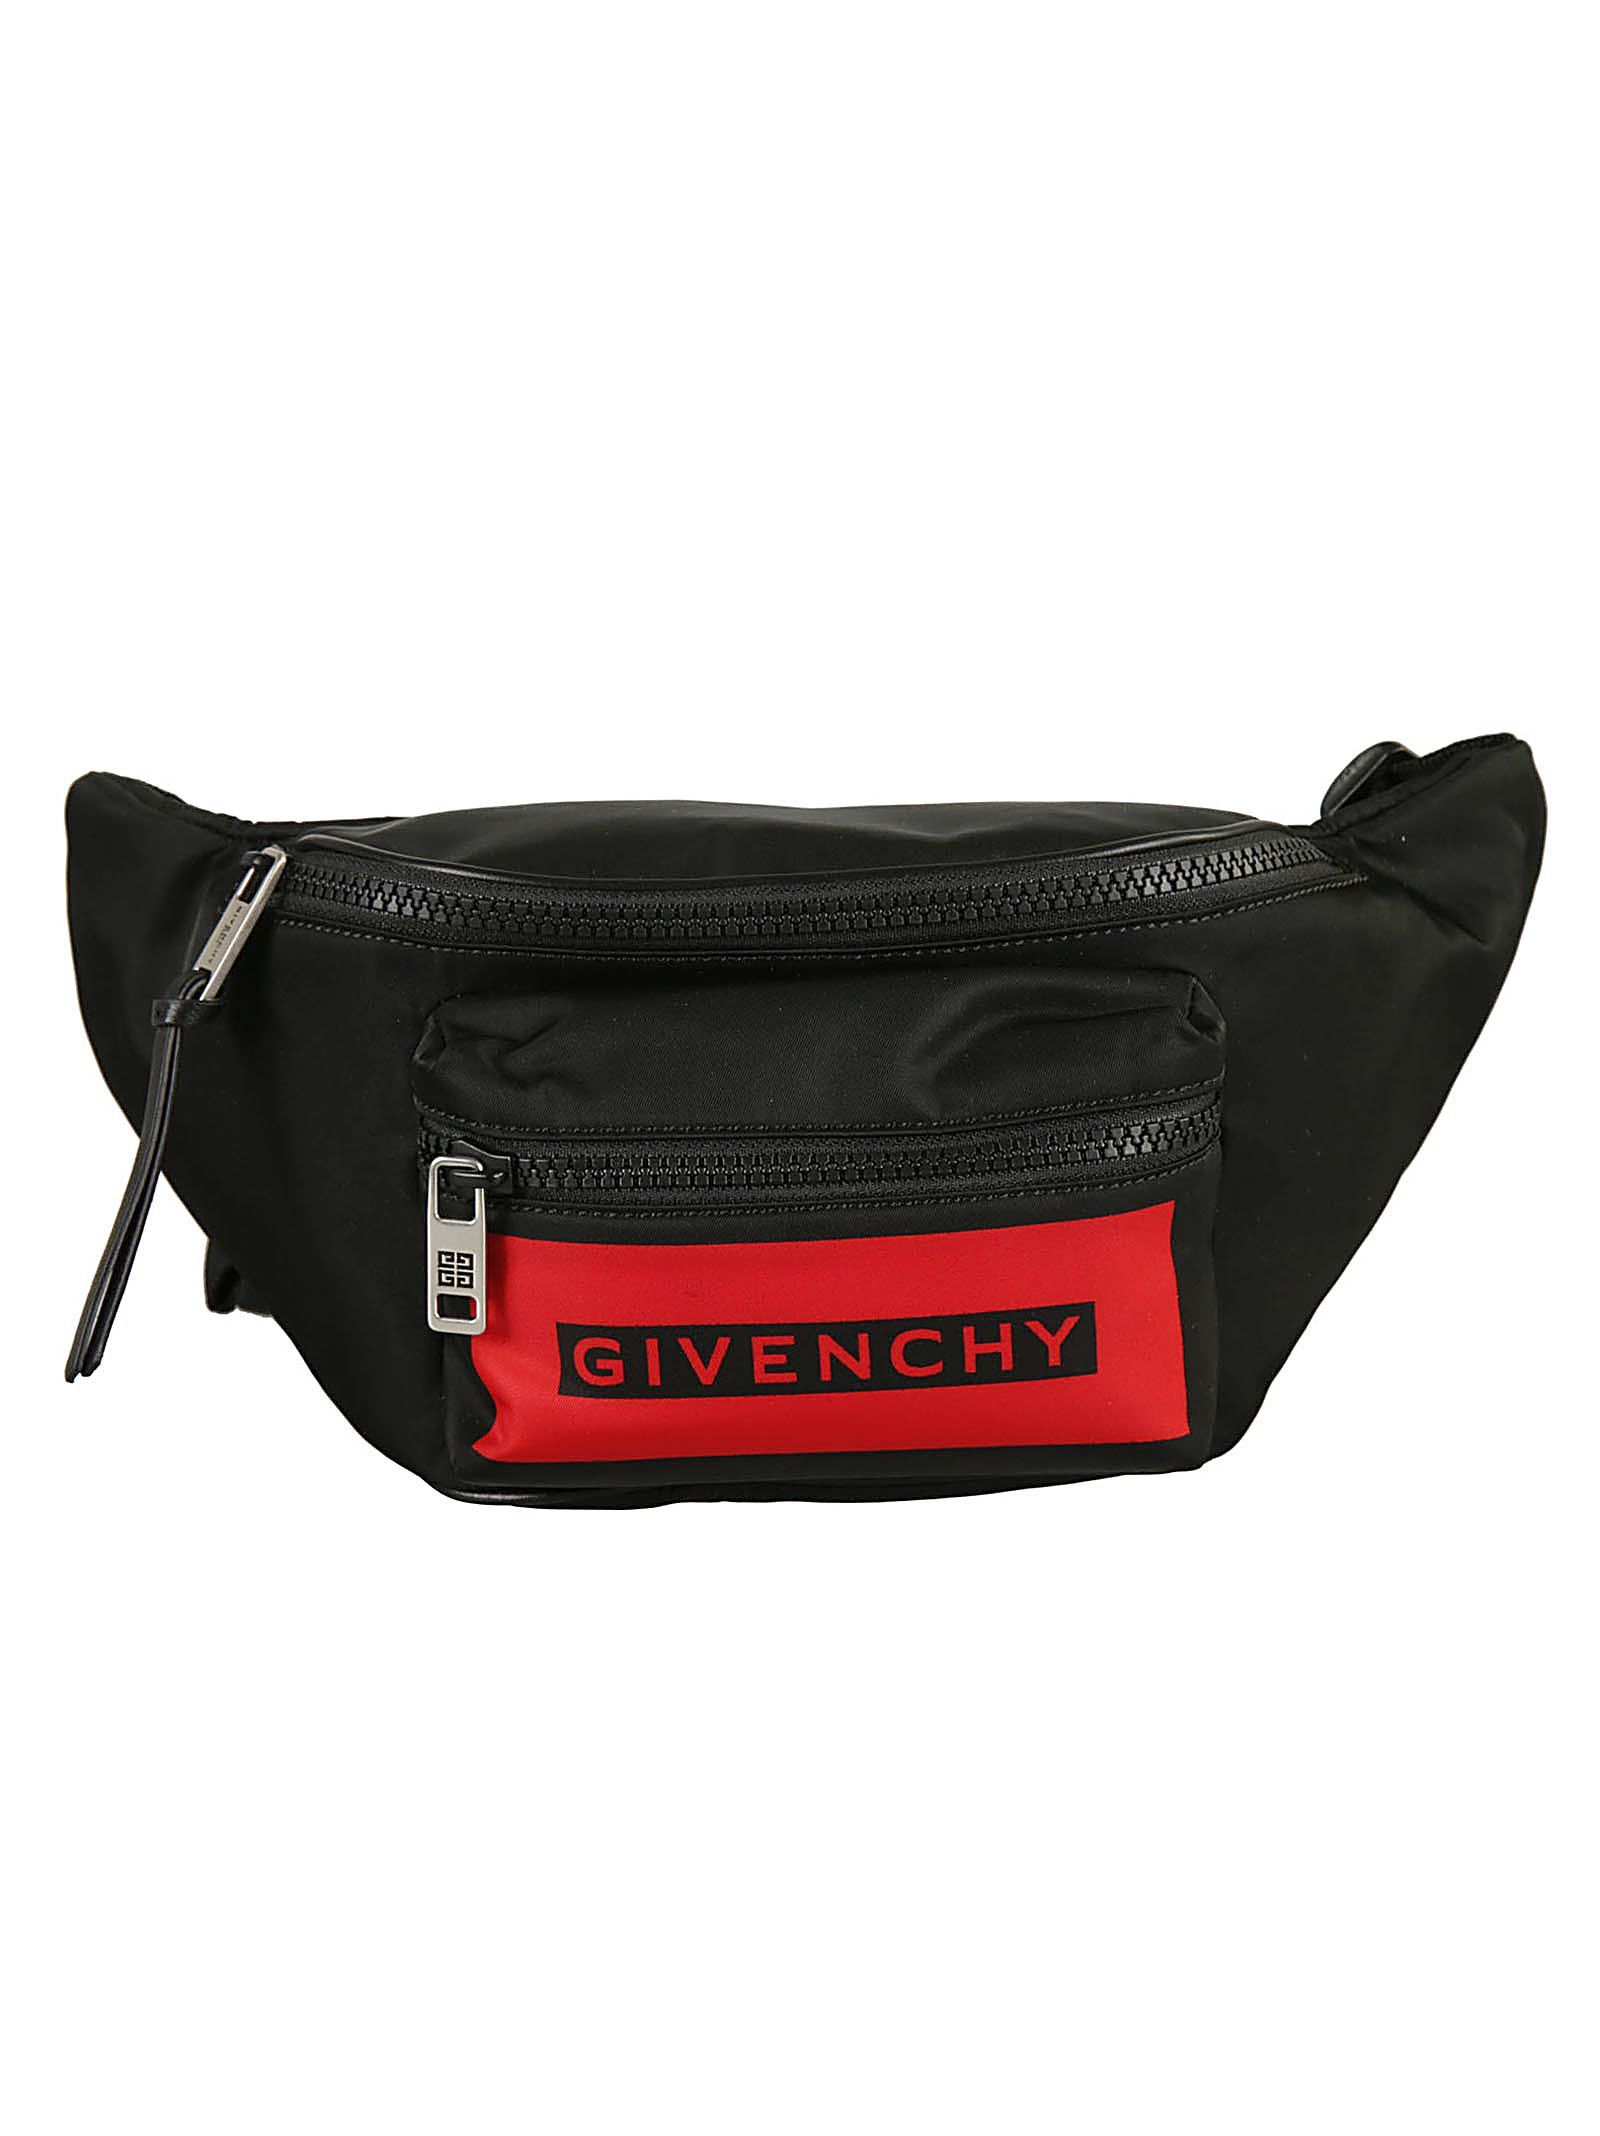 b462ec06e4 GIVENCHY LIGHT 3 BELT BAG.  givenchy  bags  belt bags